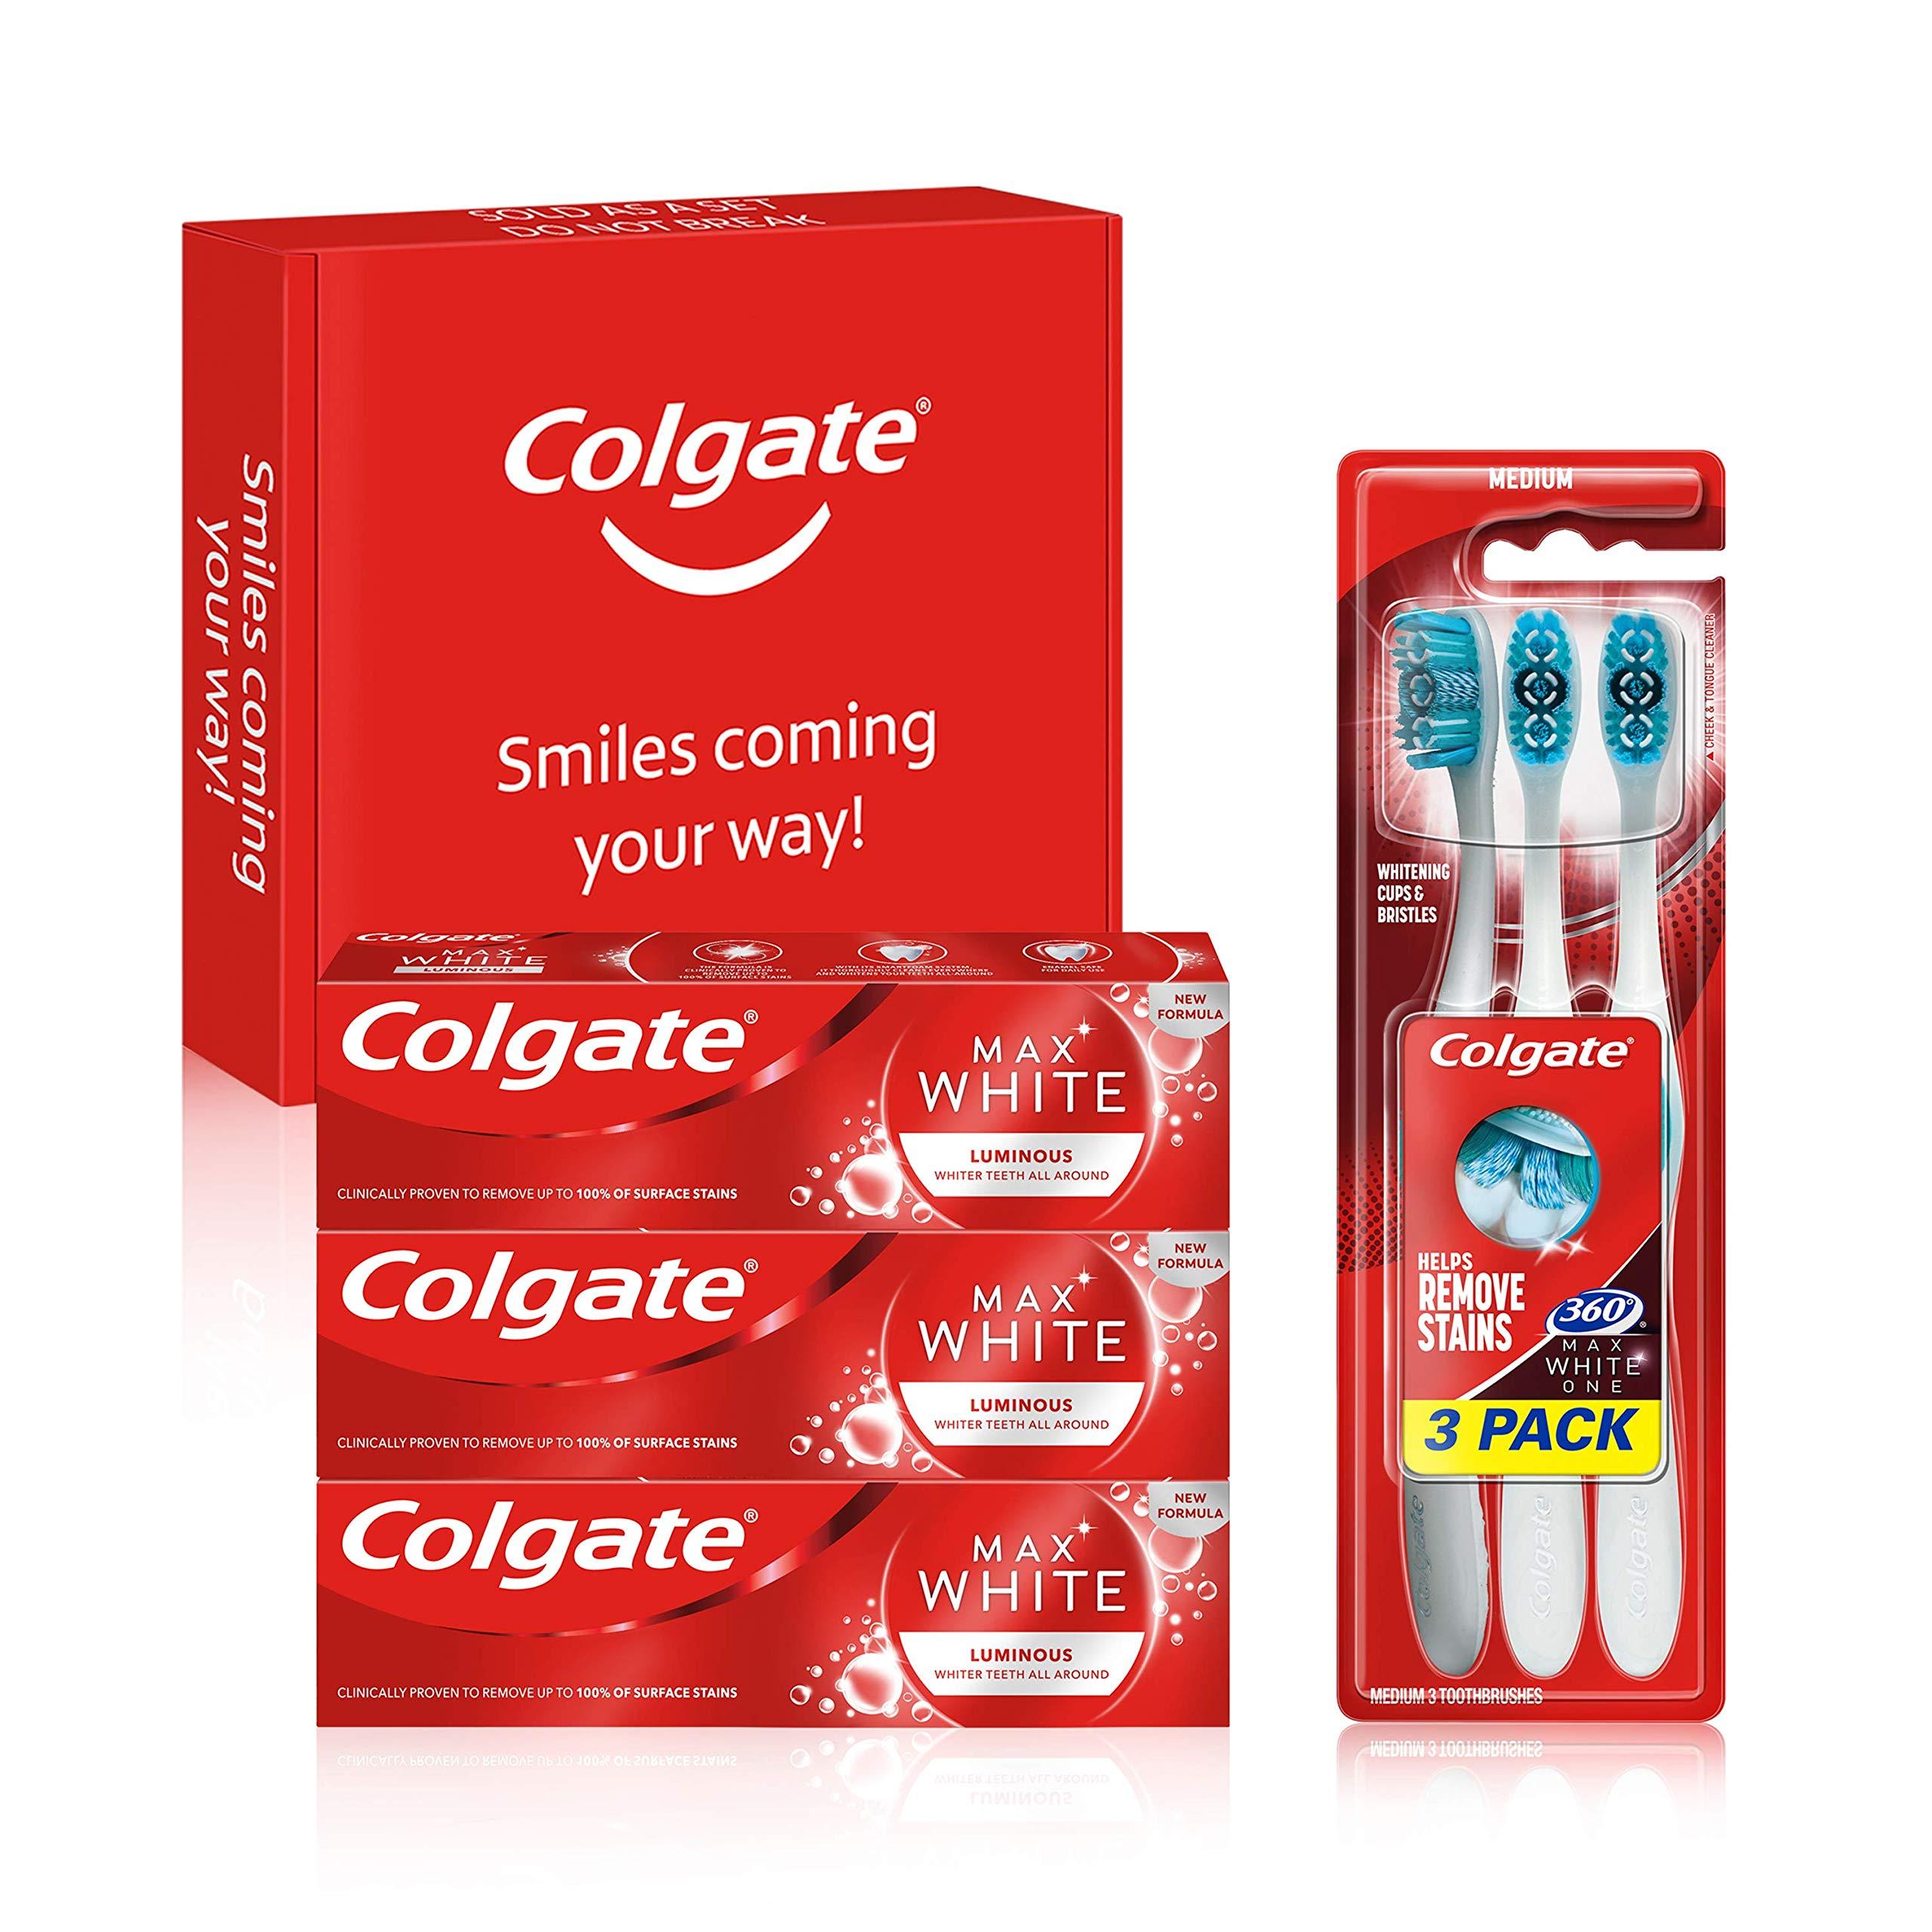 Colgate Max White Luminous Teeth Whitening Toothpaste & Toothbrush Bundle Kit, 3x75ml Toothpaste Multipack & 3 Pack Toothbrush